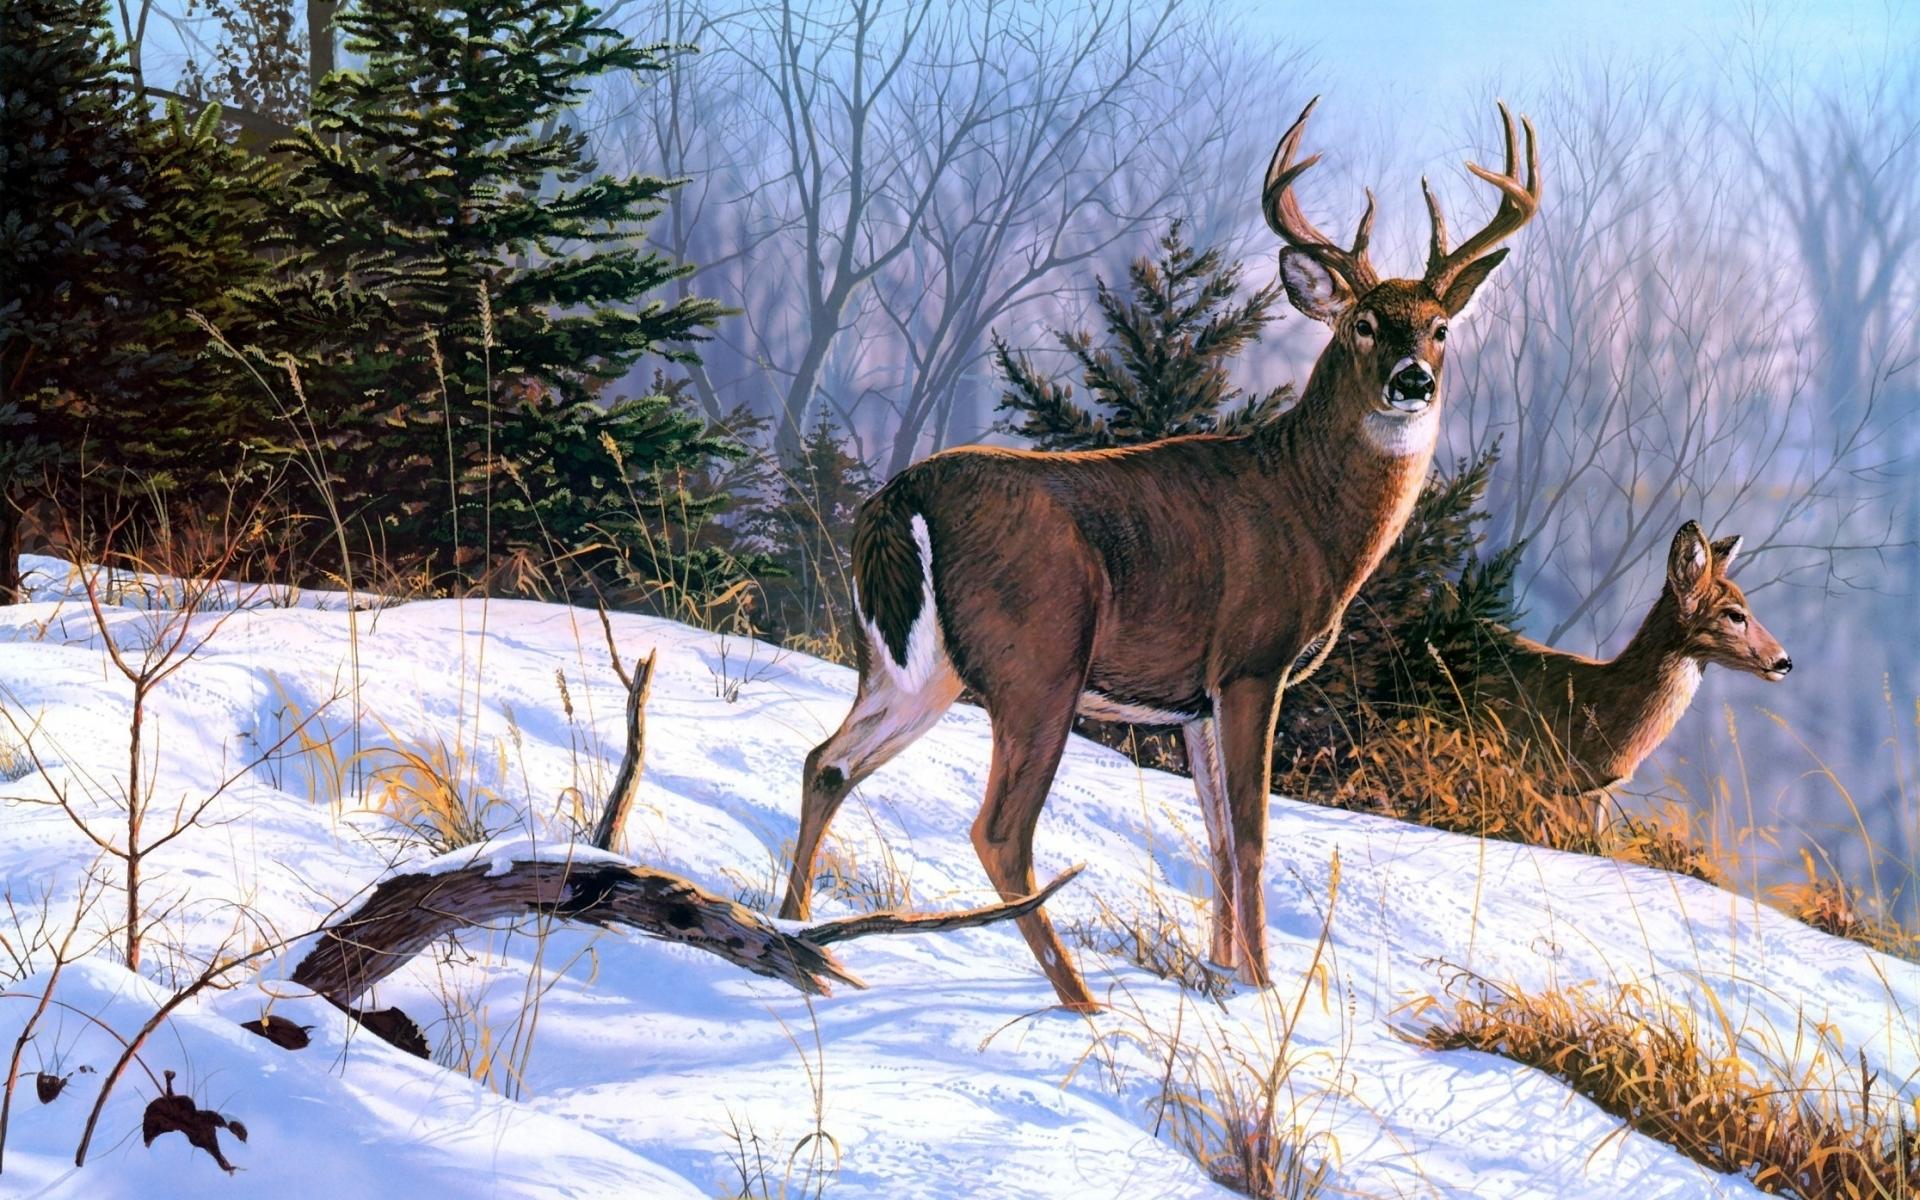 Deer art nature paintings winter wallpaper 1920x1200 29059 1920x1200